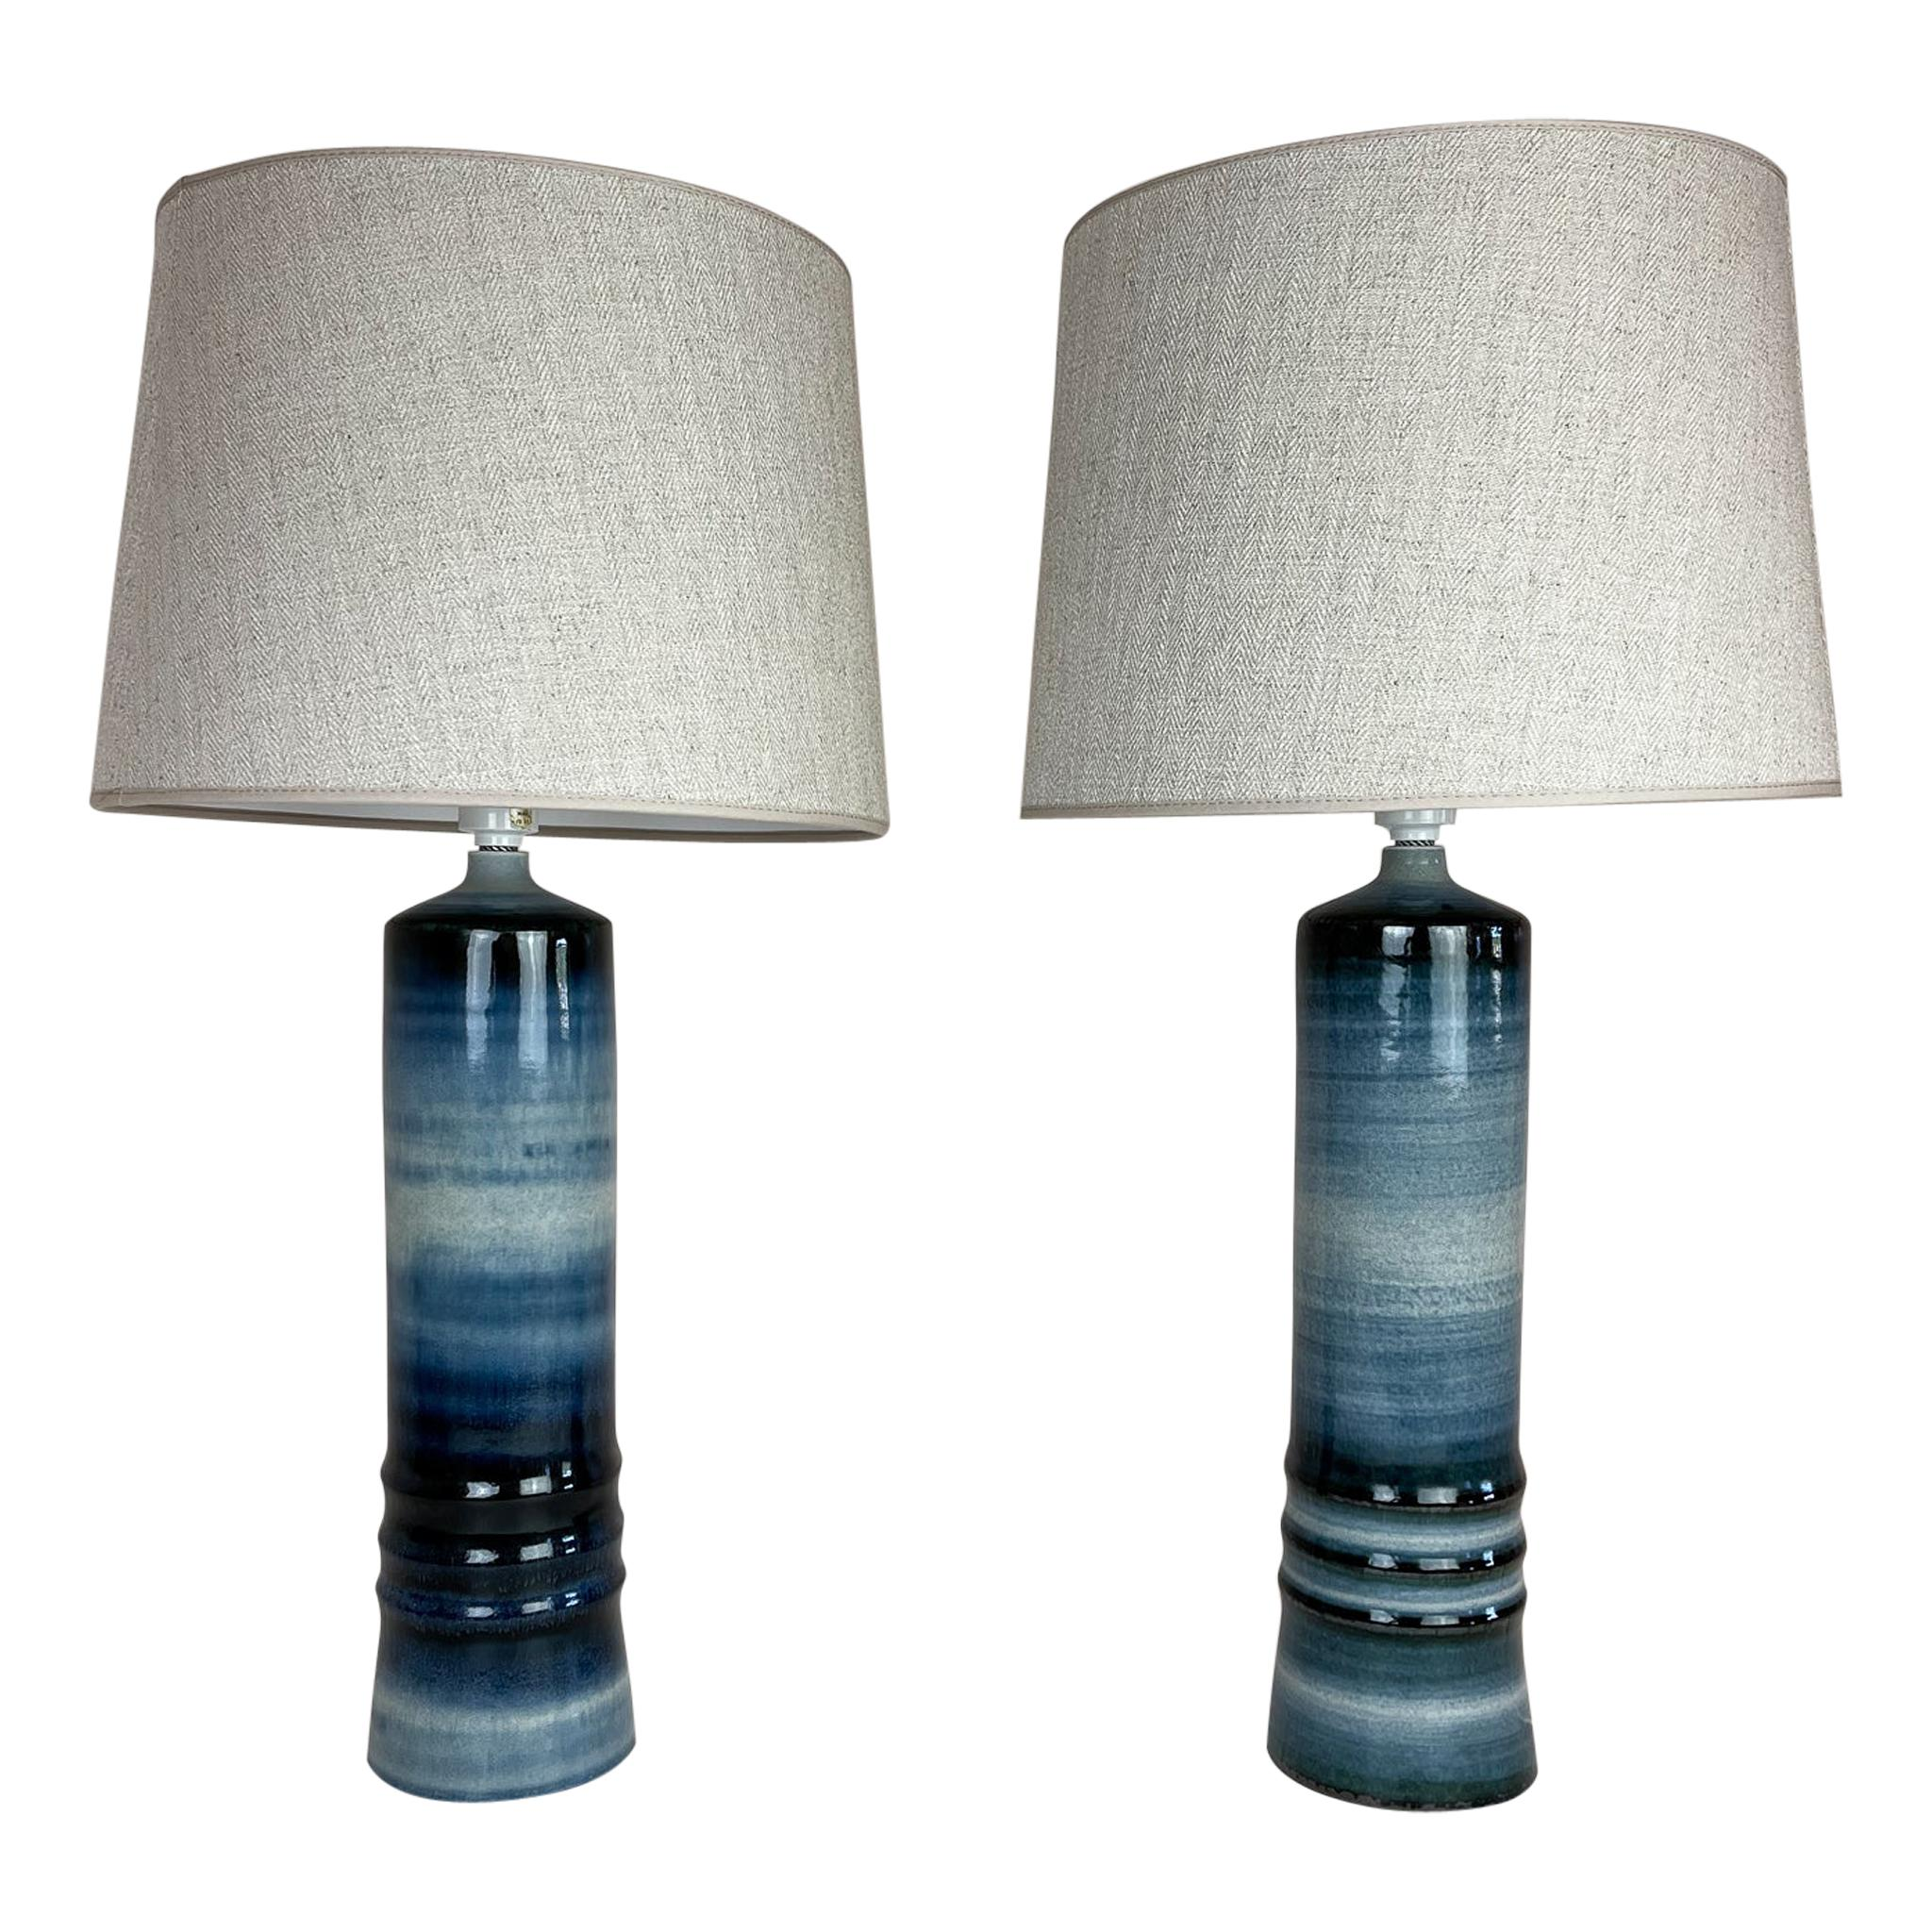 Mid-Century Modern Ceramic Pair of Table Lamps Rörstrand Olle Alberius Sweden